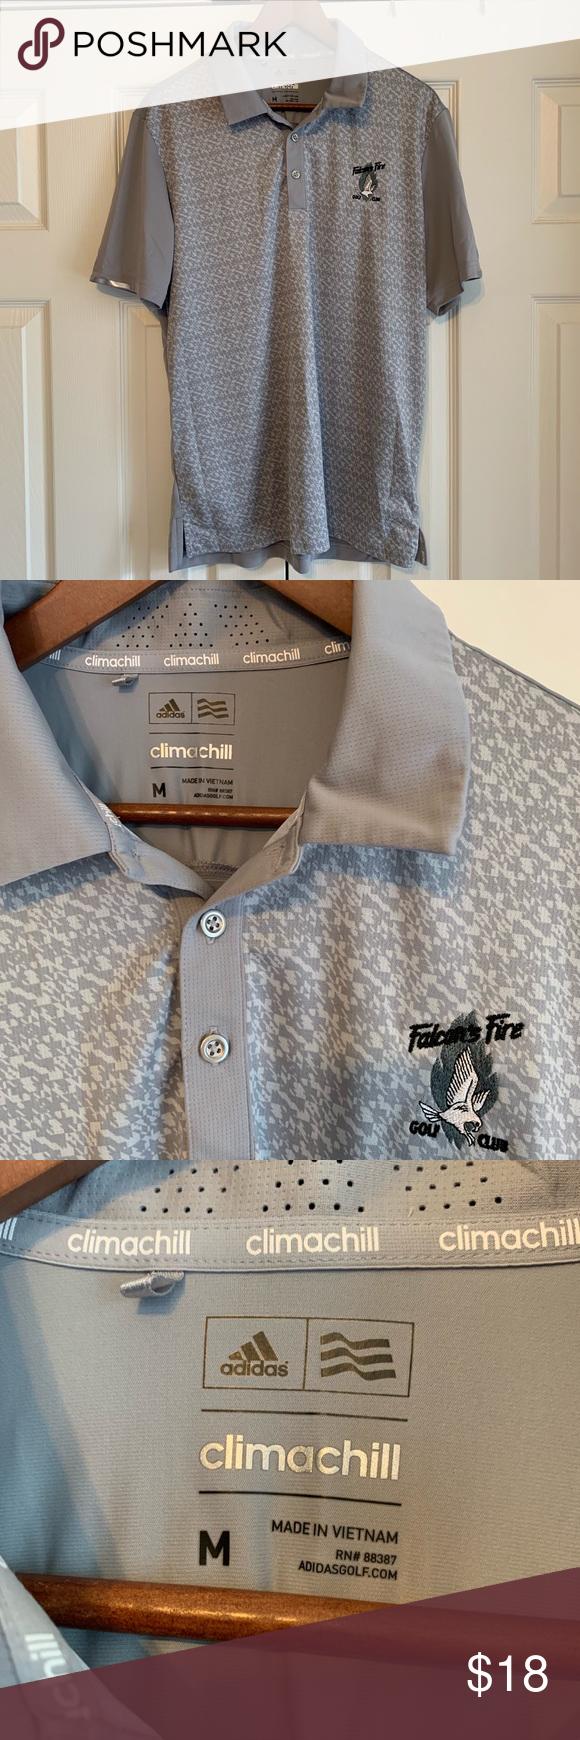 14+ Adidas climachill golf polo viral